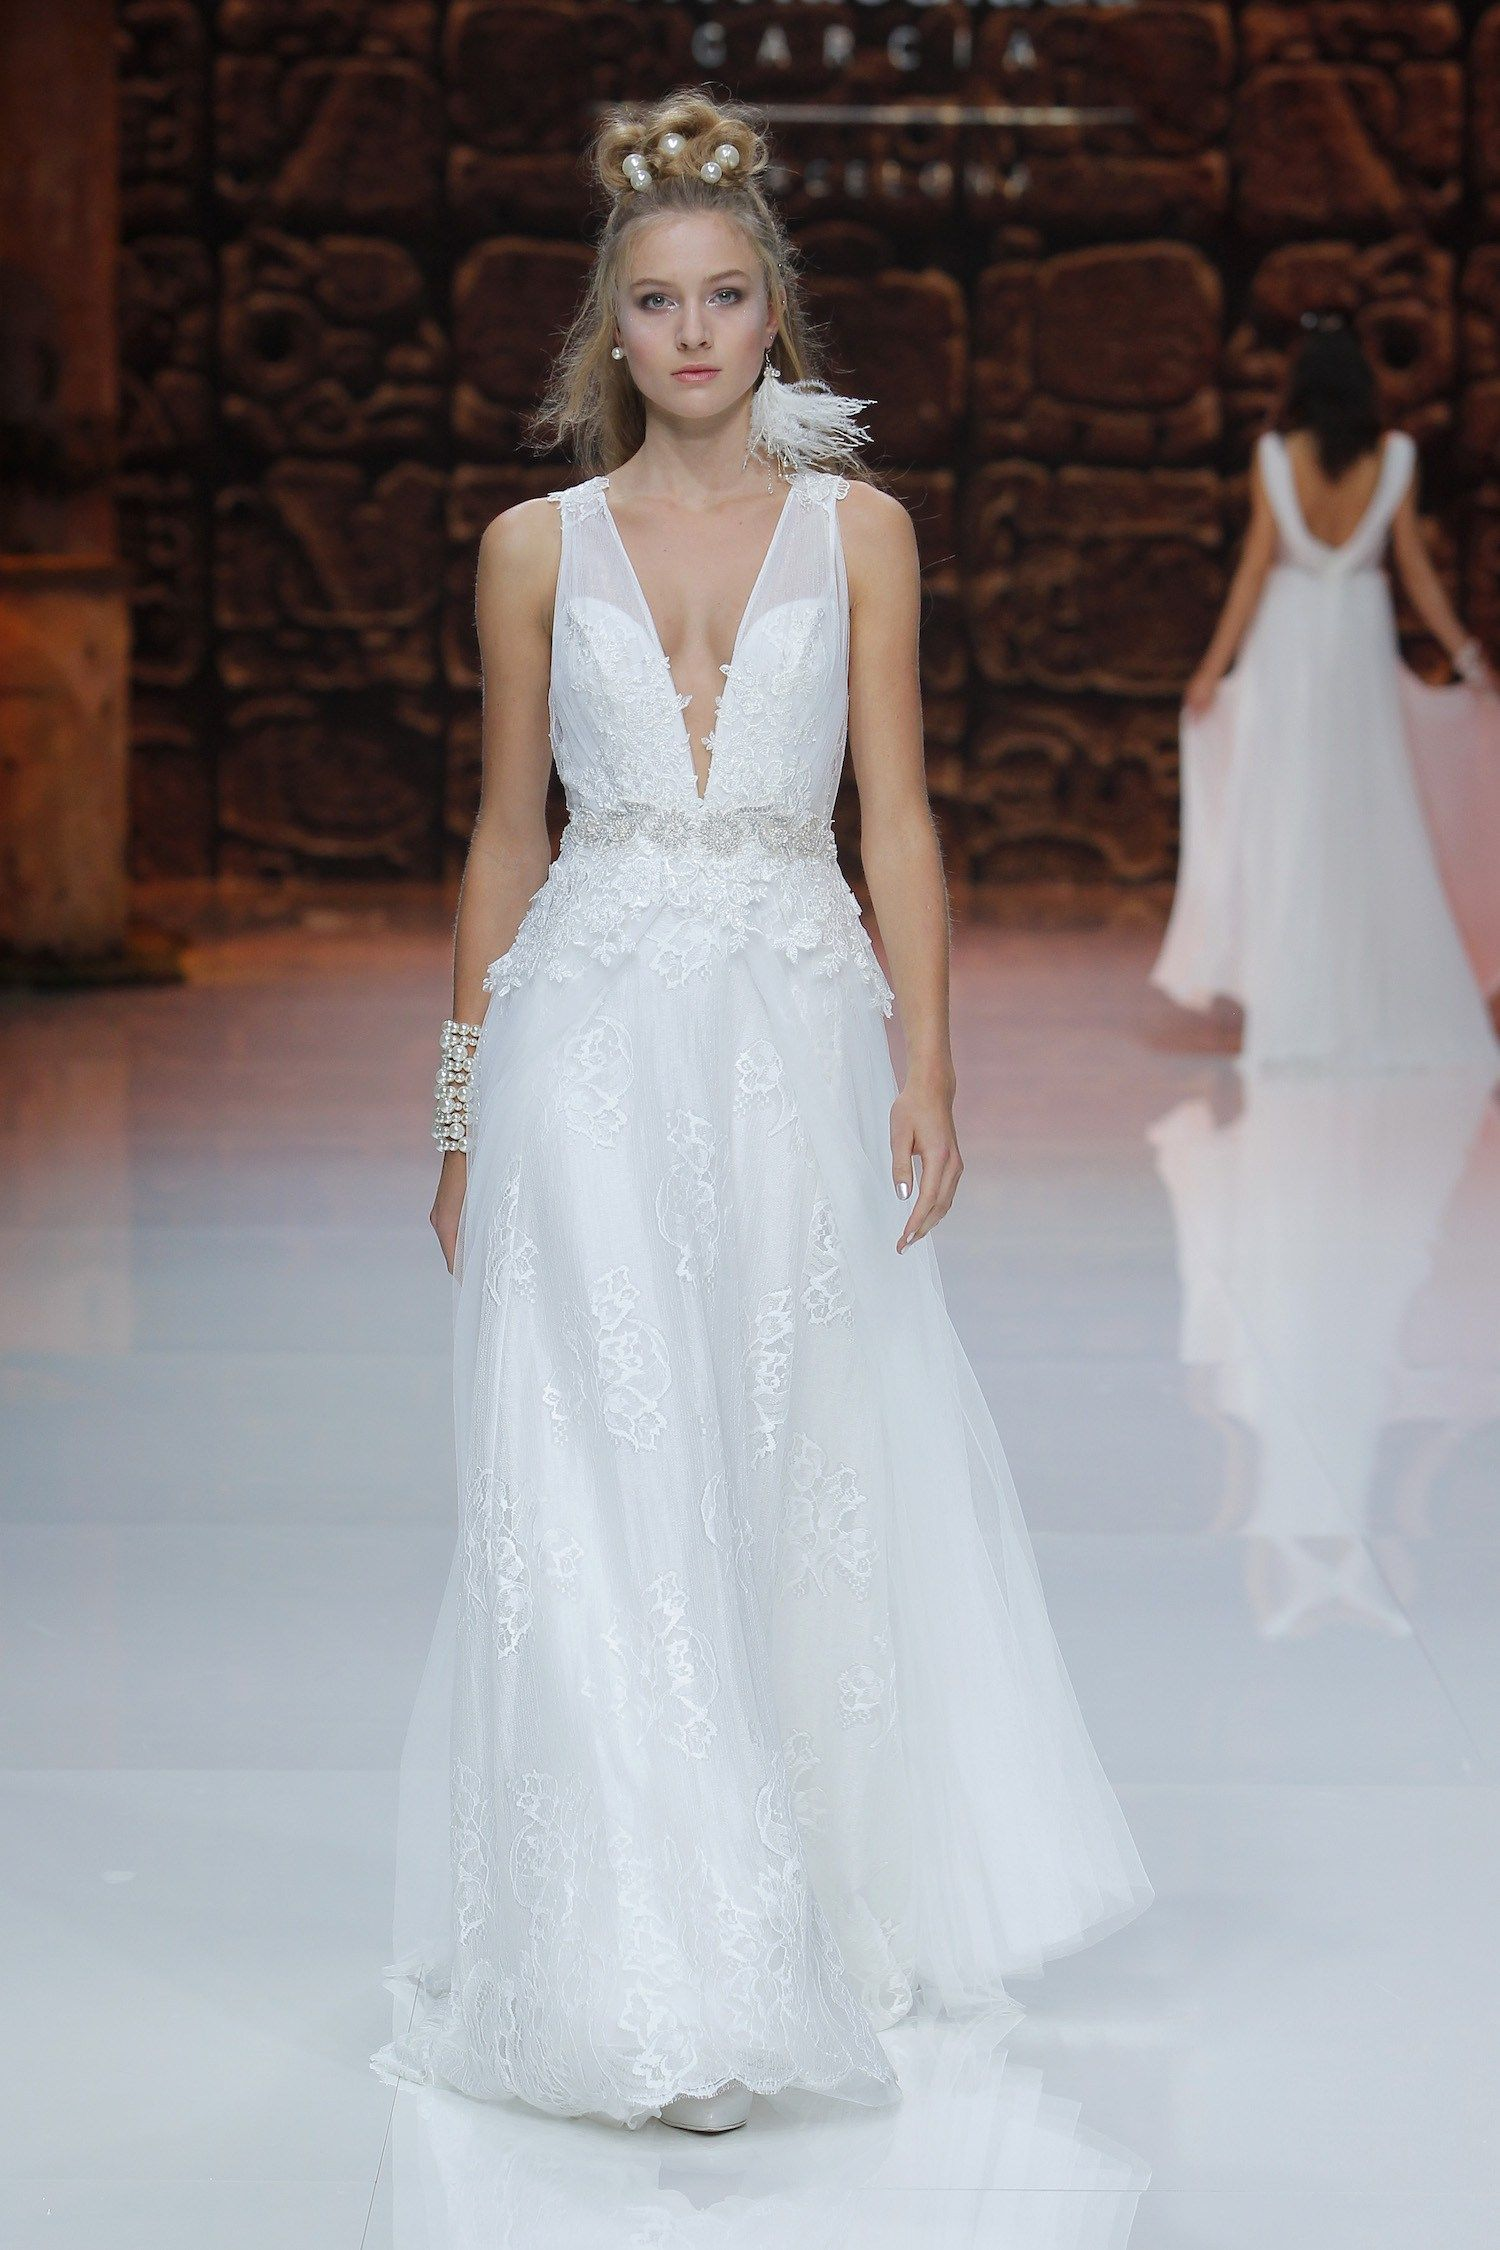 Perfect Vestidos Novia Franc Sarabia Images - All Wedding Dresses ...